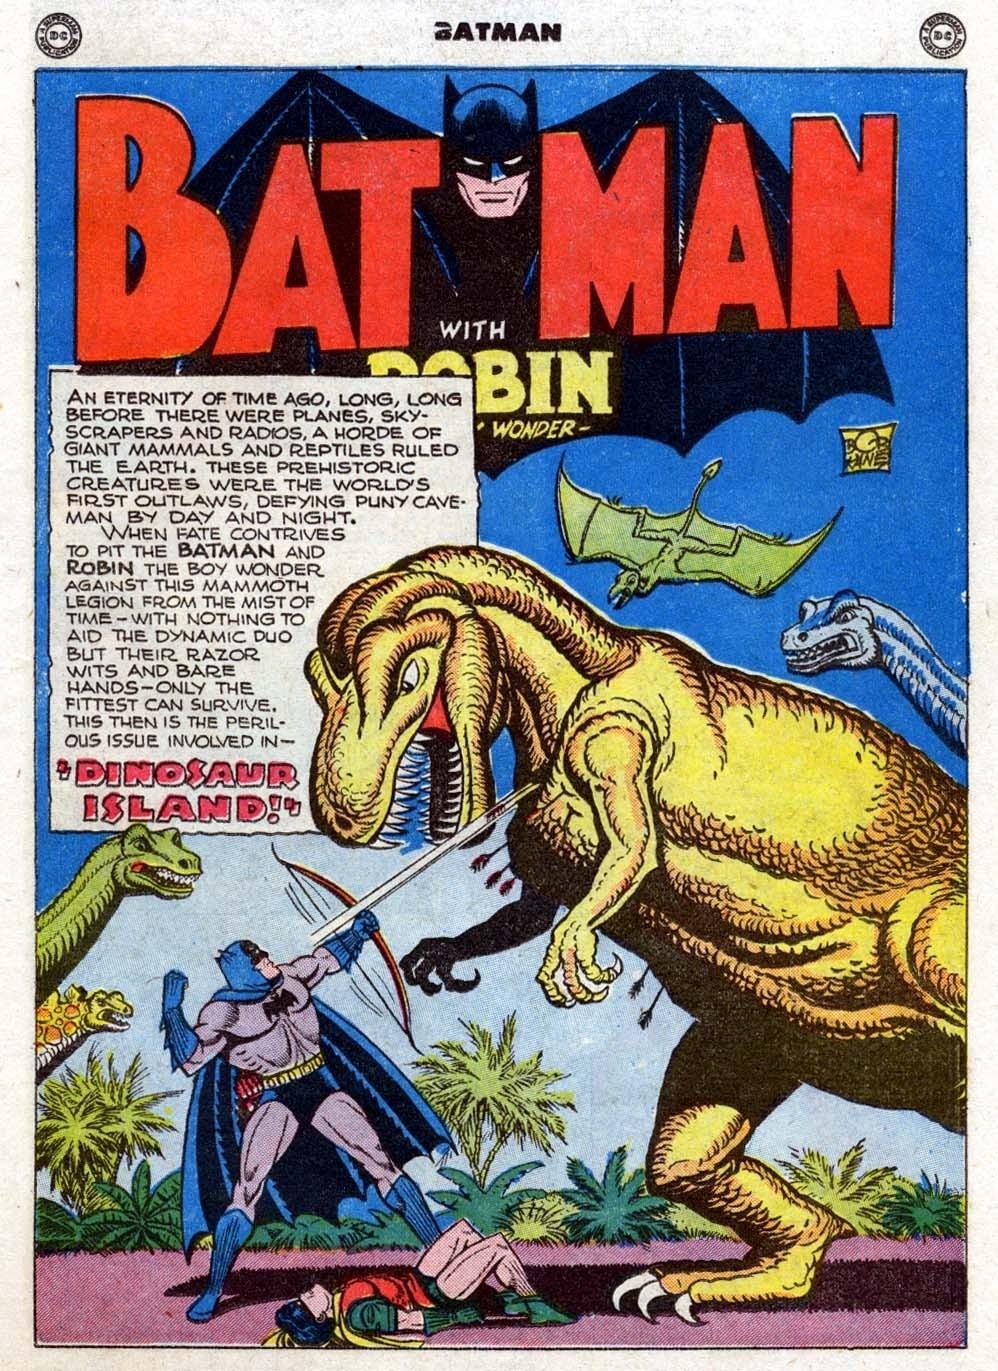 Batman Issue 35 Dinosaur Island Panel